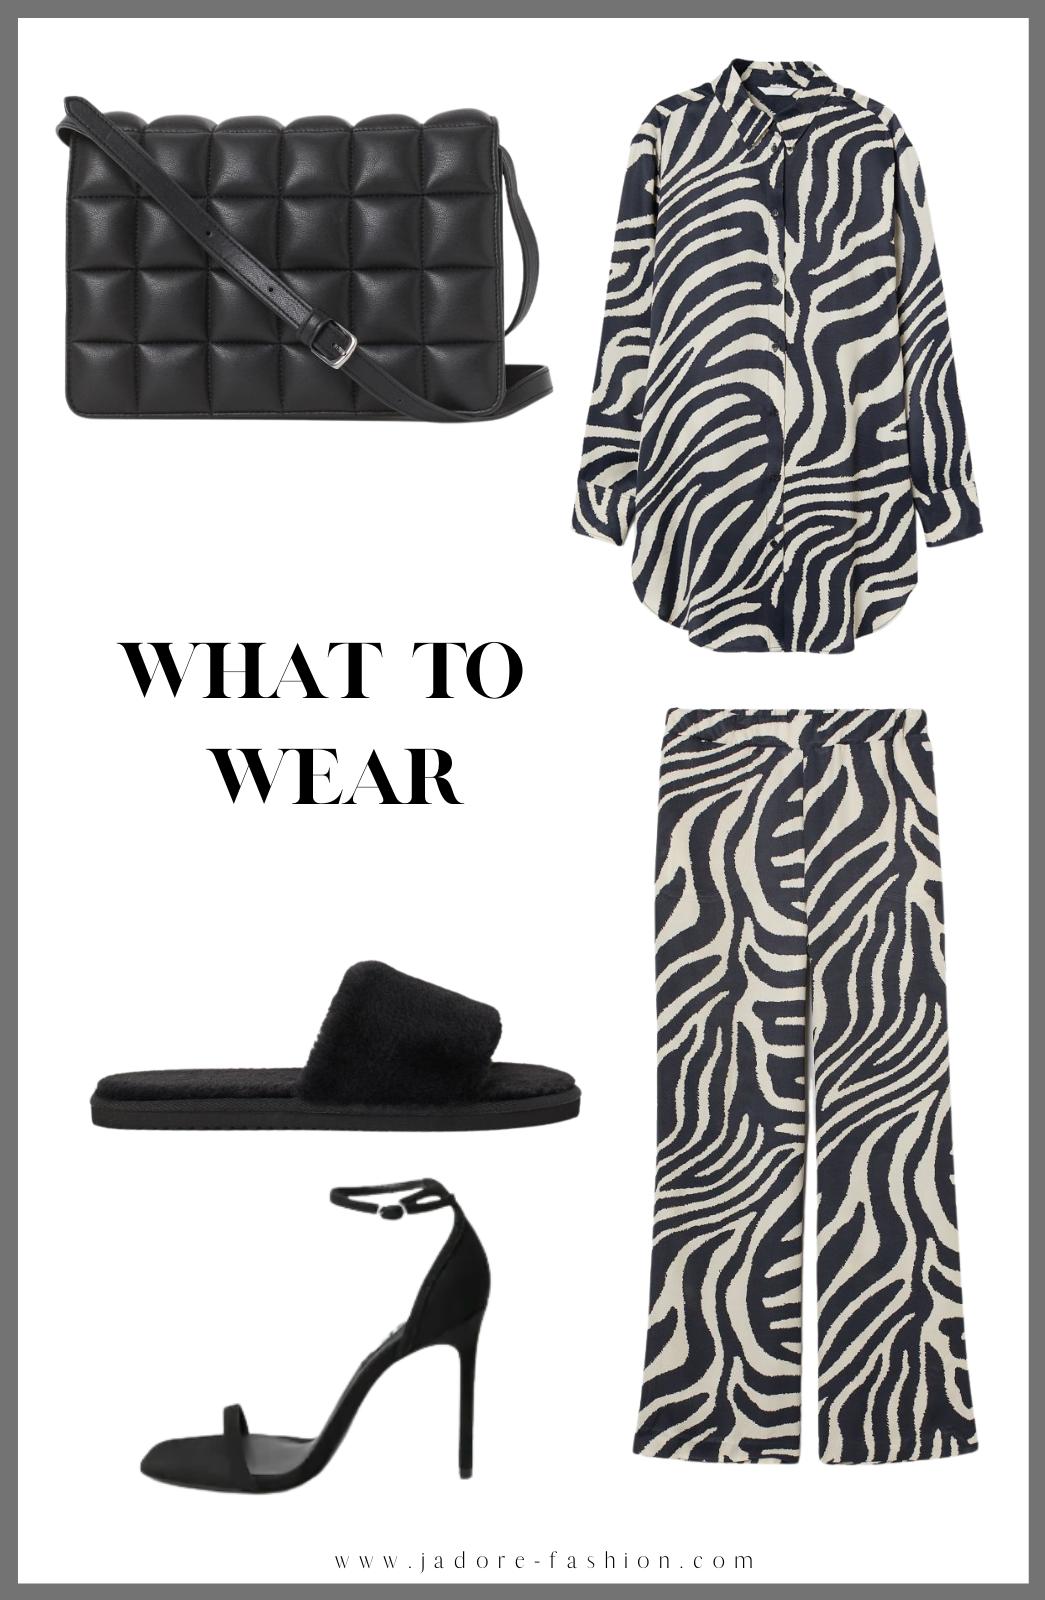 Stella-adewunmi-of-jadore-fashion-blog-share-hm-satin-print-pants-blouse